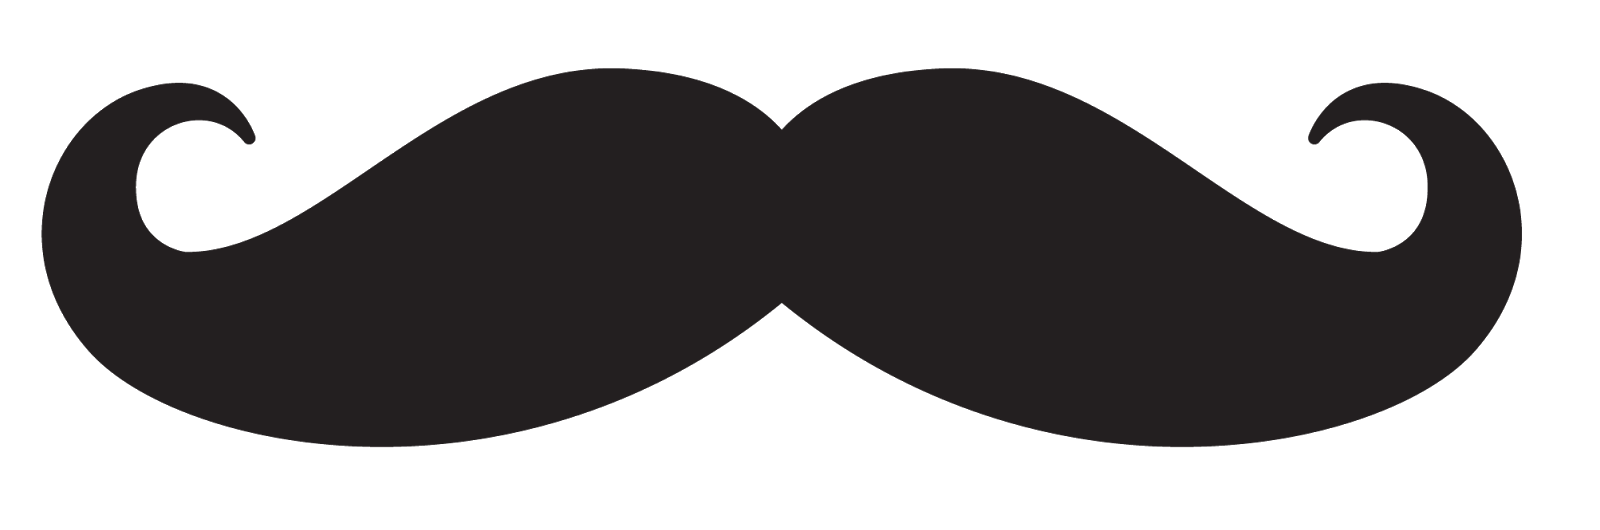 Jalapeno clipart mustache. Index of cdn mustacheclipartprintablesjpg